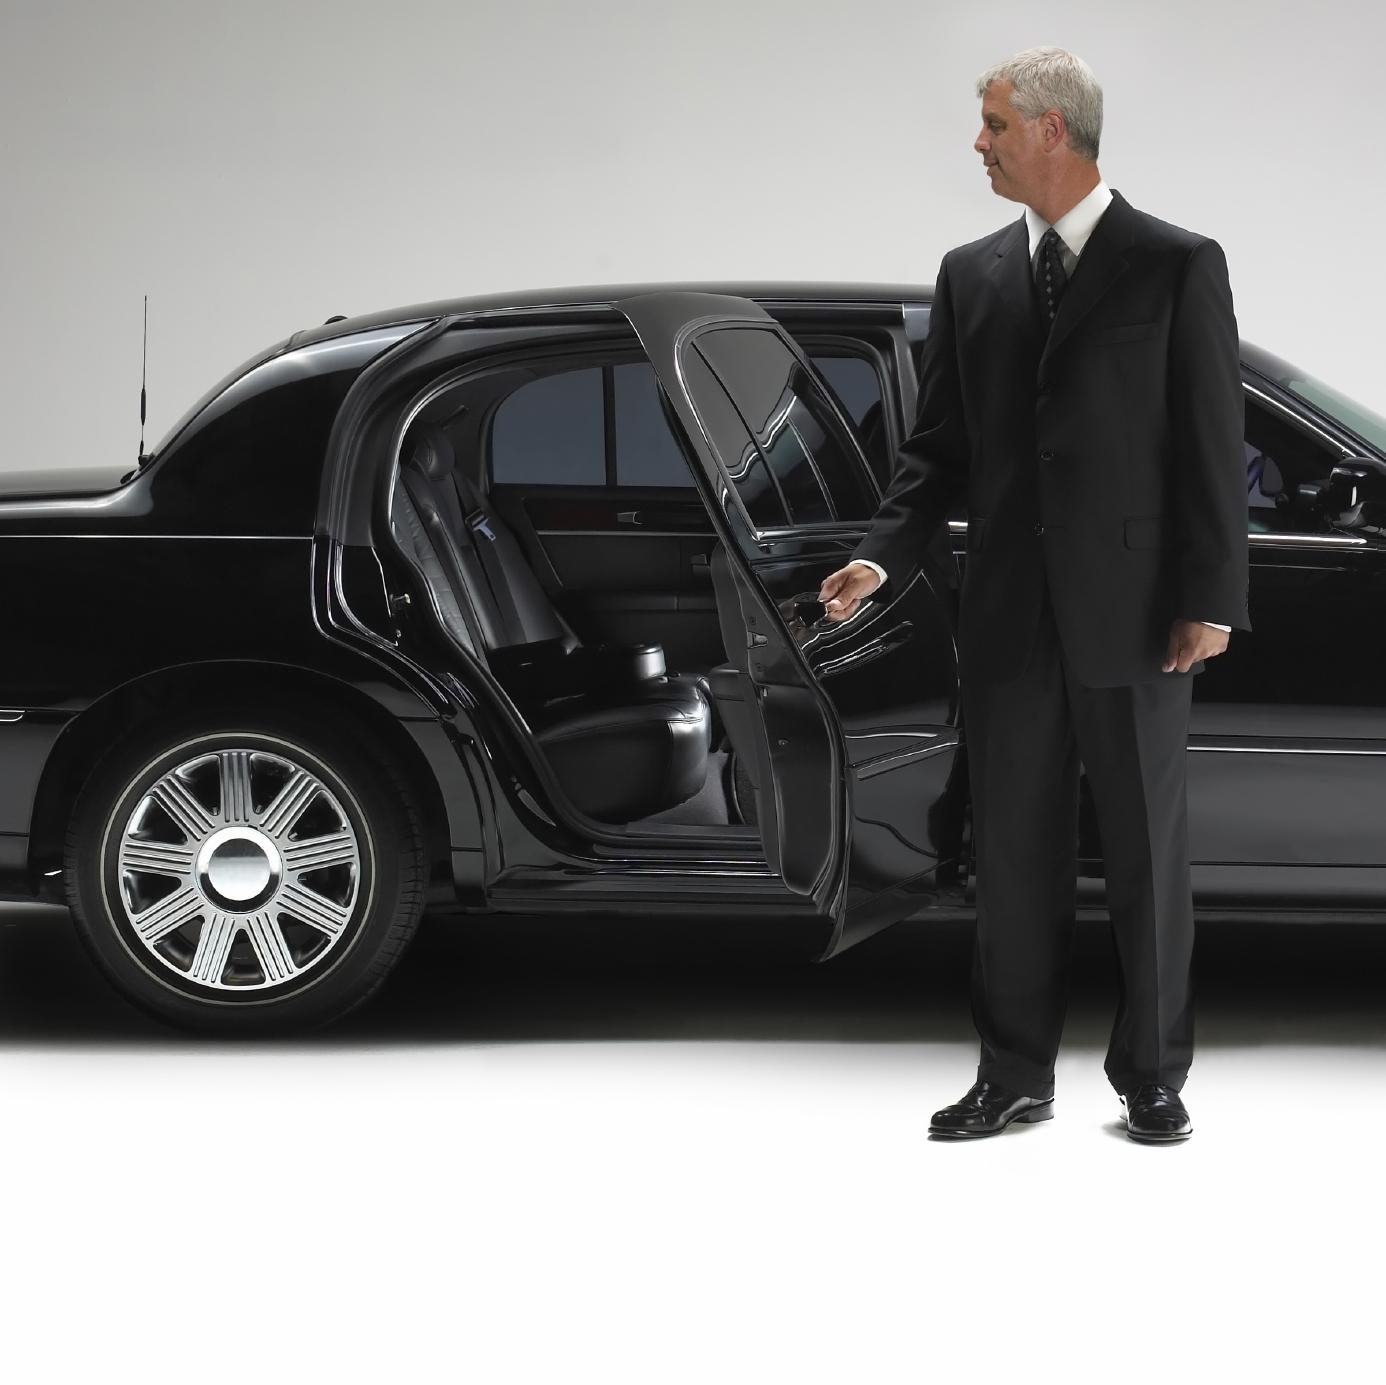 service chauffeur location limousine. Black Bedroom Furniture Sets. Home Design Ideas